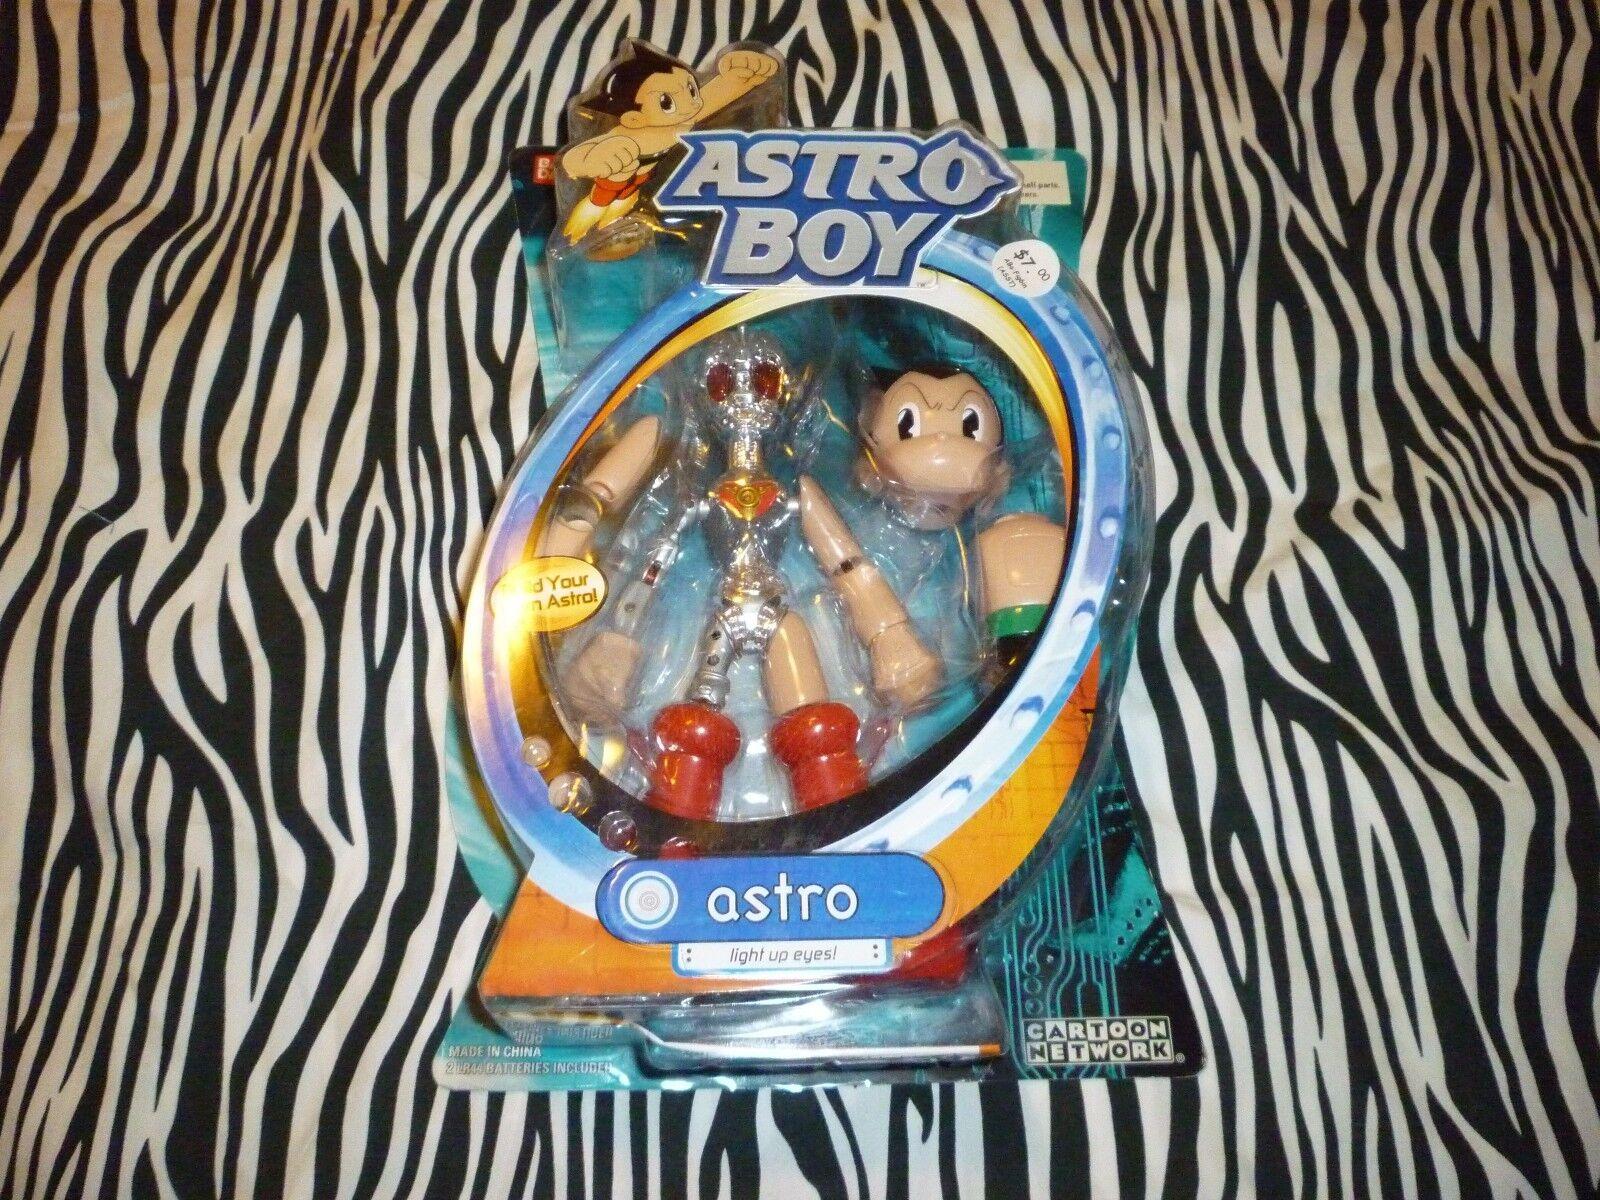 Astro Boy Action Figure - Build Your Own Astro 6